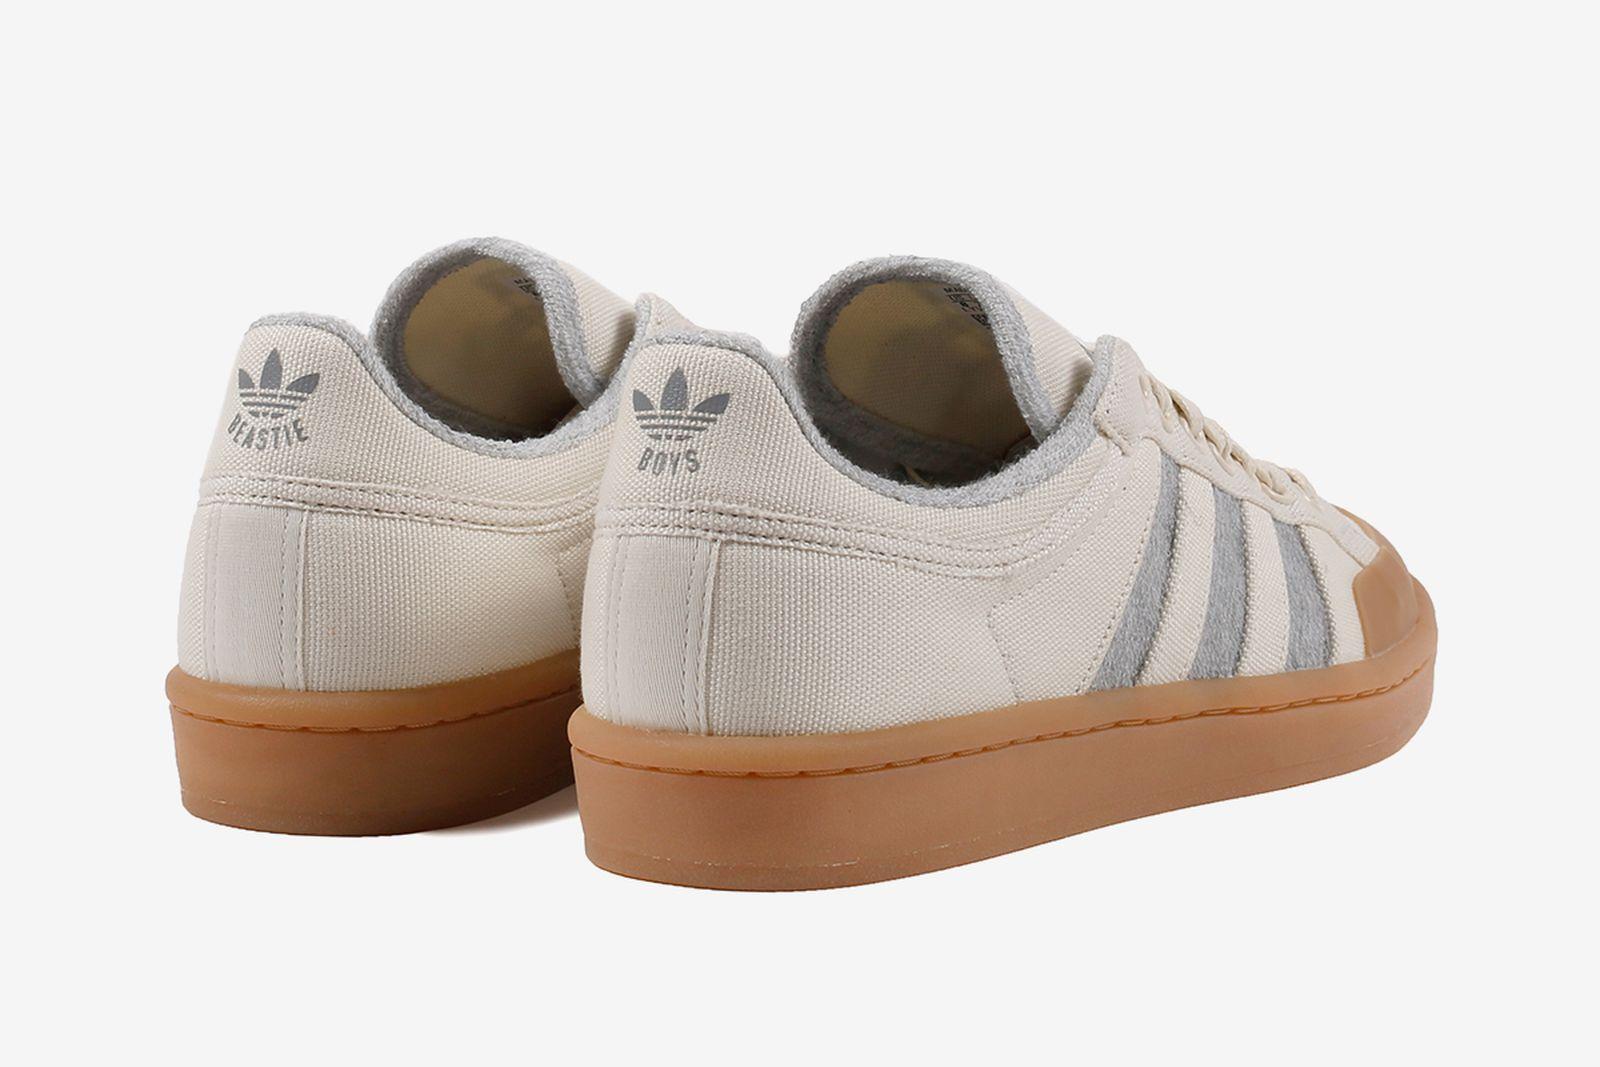 beastie boys adidas americana release date price adidas skateboarding